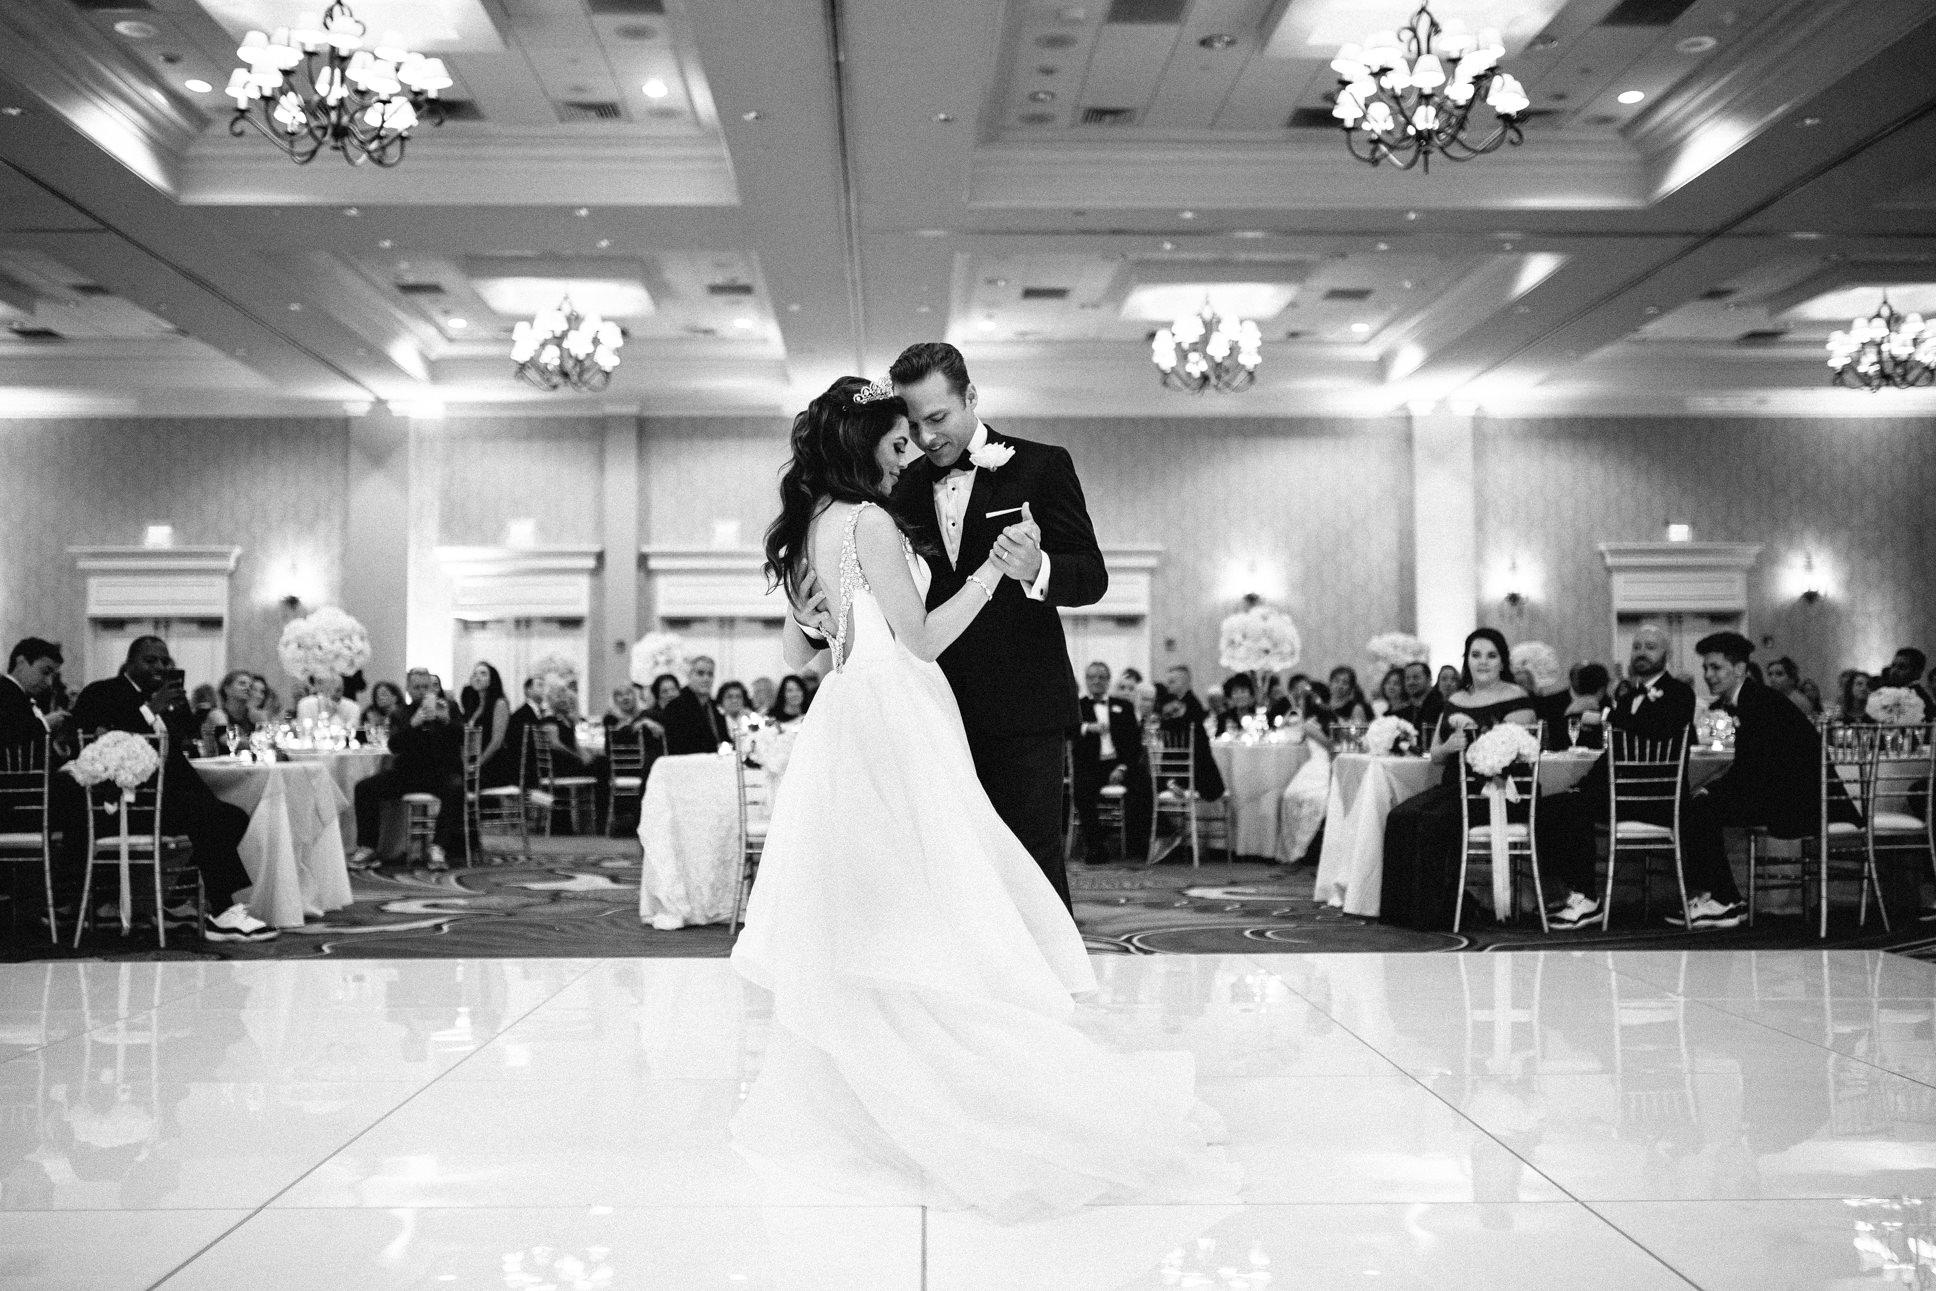 Black and White Romantic Bride and Groom First Dance Wedding Portrait   Tropical Waterfront Hotel Ballroom Wedding Venue The Vinoy Renaissance St. Pete Resort & Golf Club   Tampa Bay Wedding DJ Grant Hemond & Associates